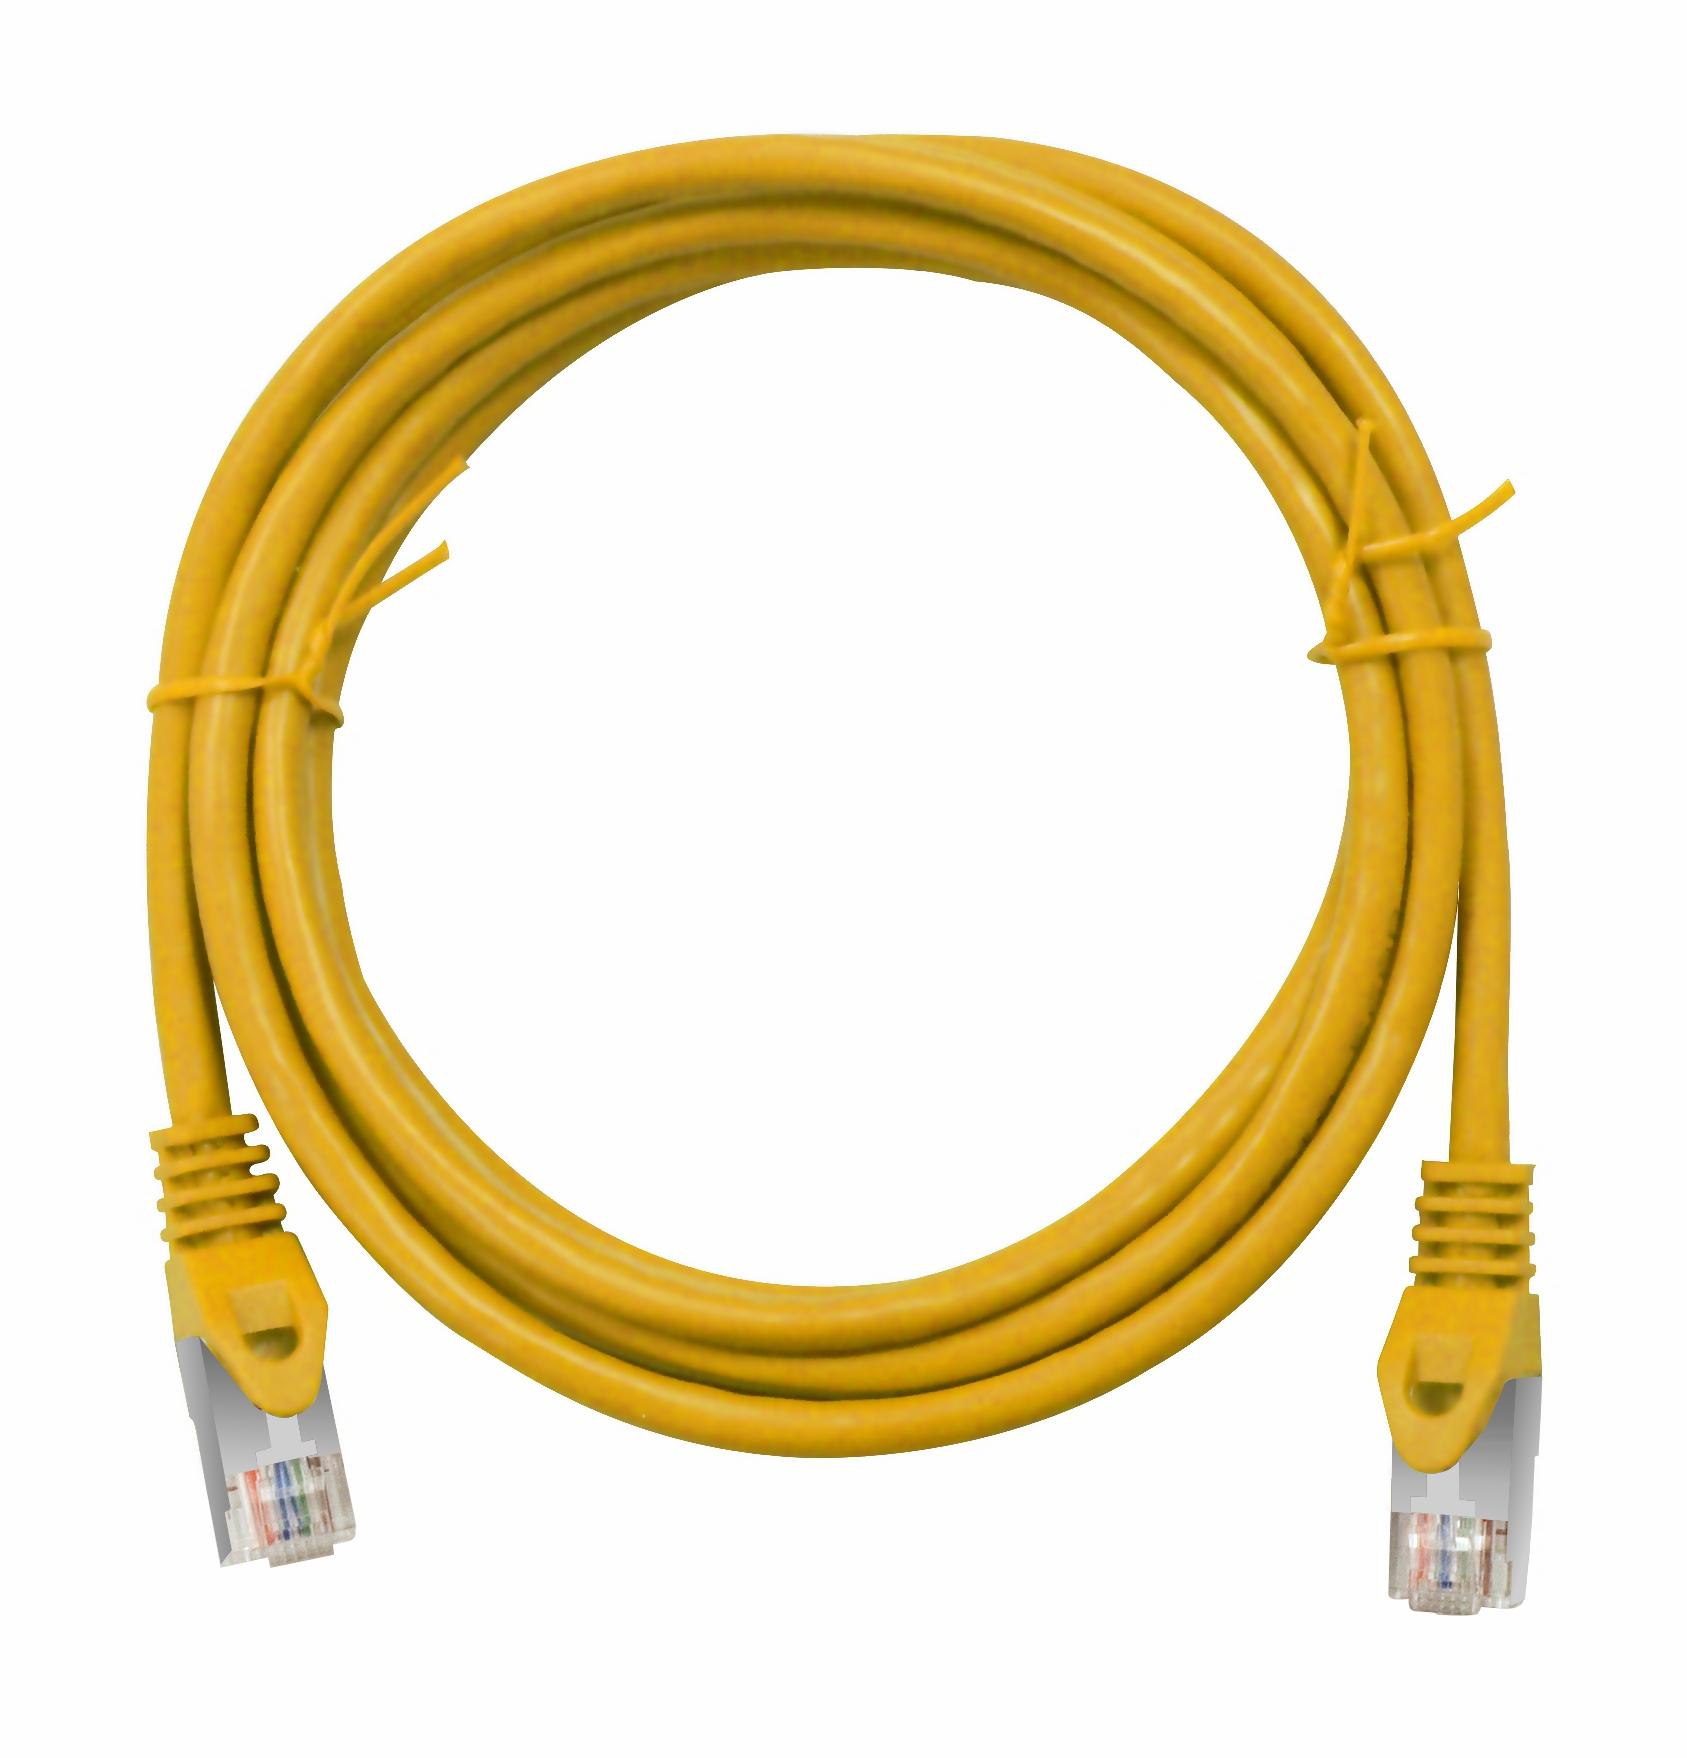 1 Stk Patchkabel RJ45 geschirmt Cat.6, PVC, gelb, 0,5m H6GLY00K5Y